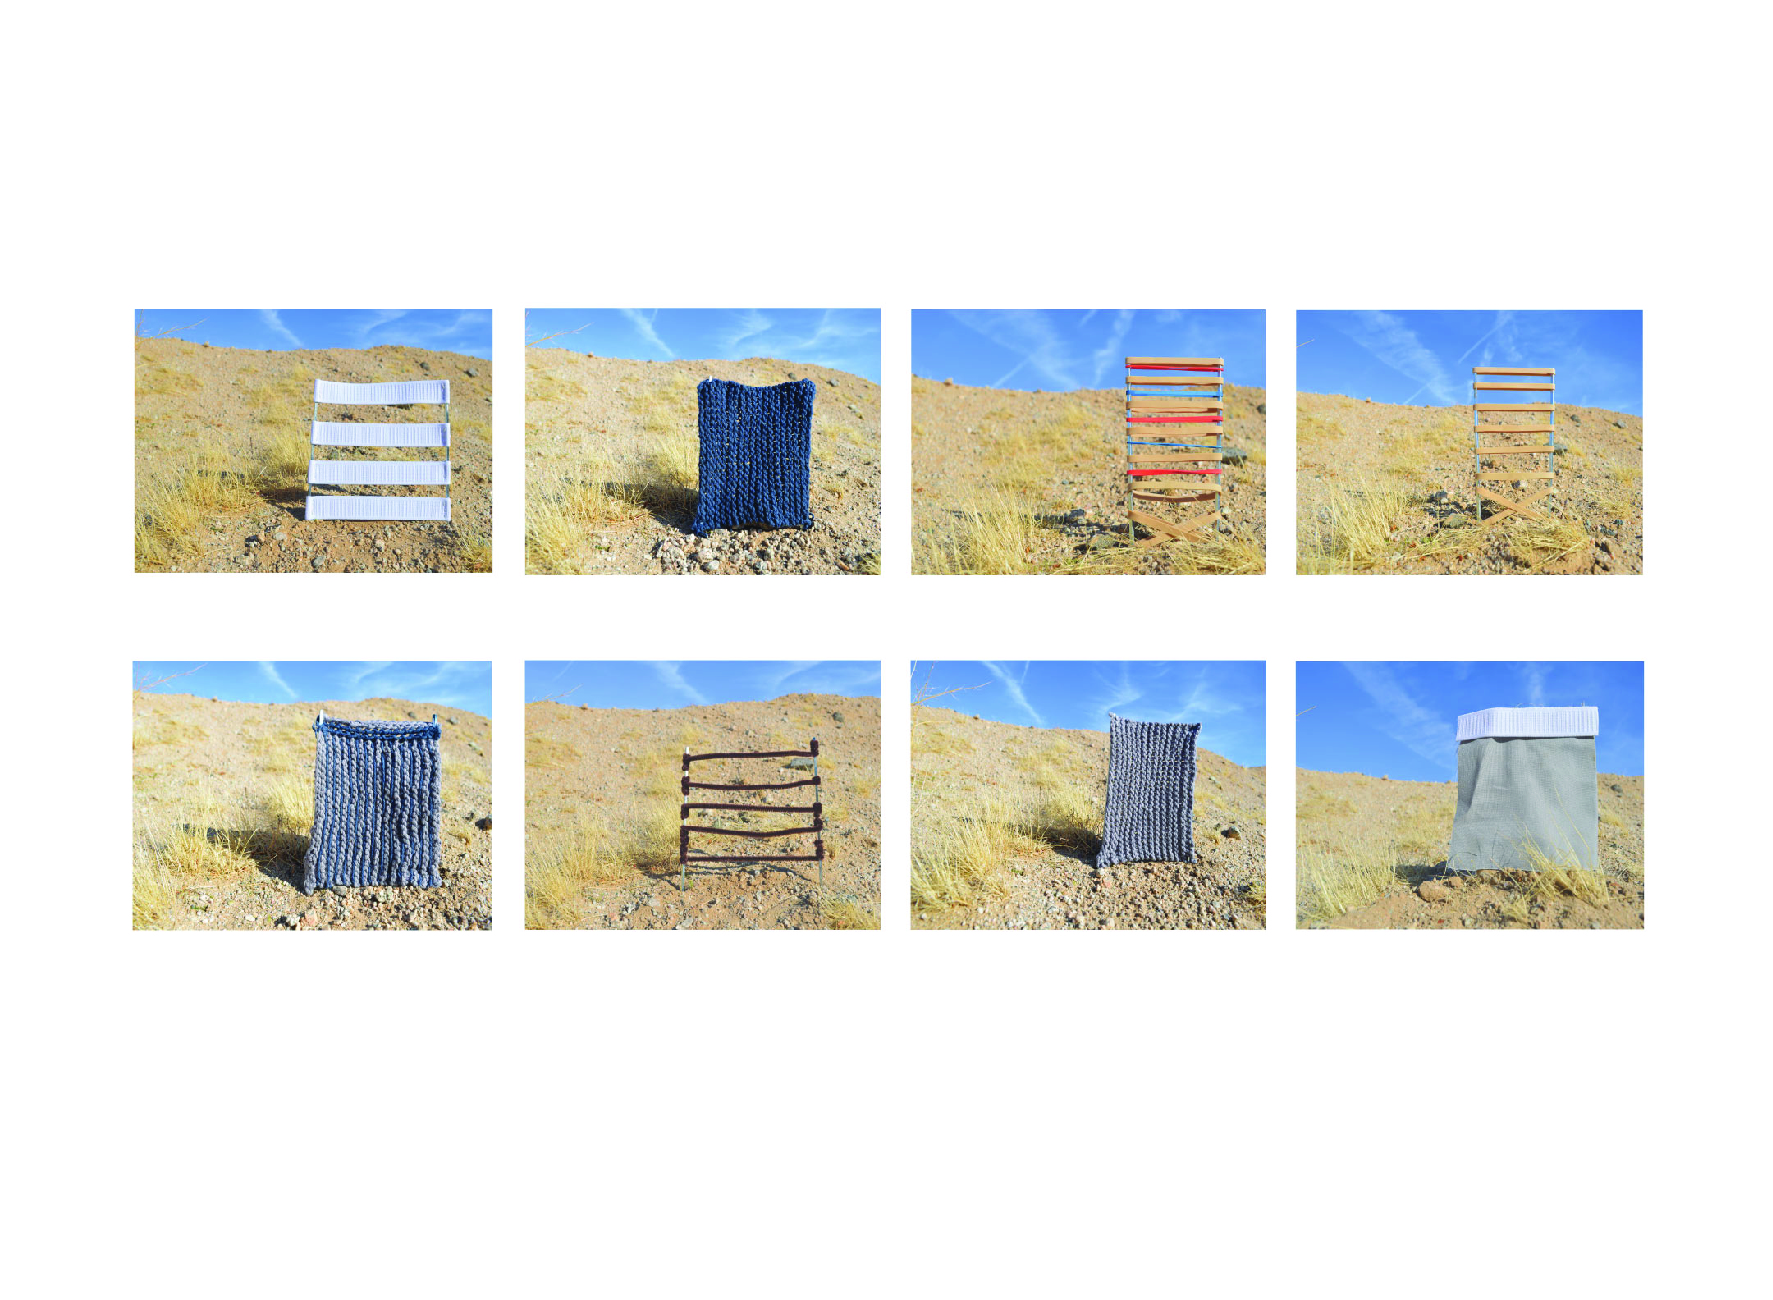 Blake_prototypes4x6(1).jpg